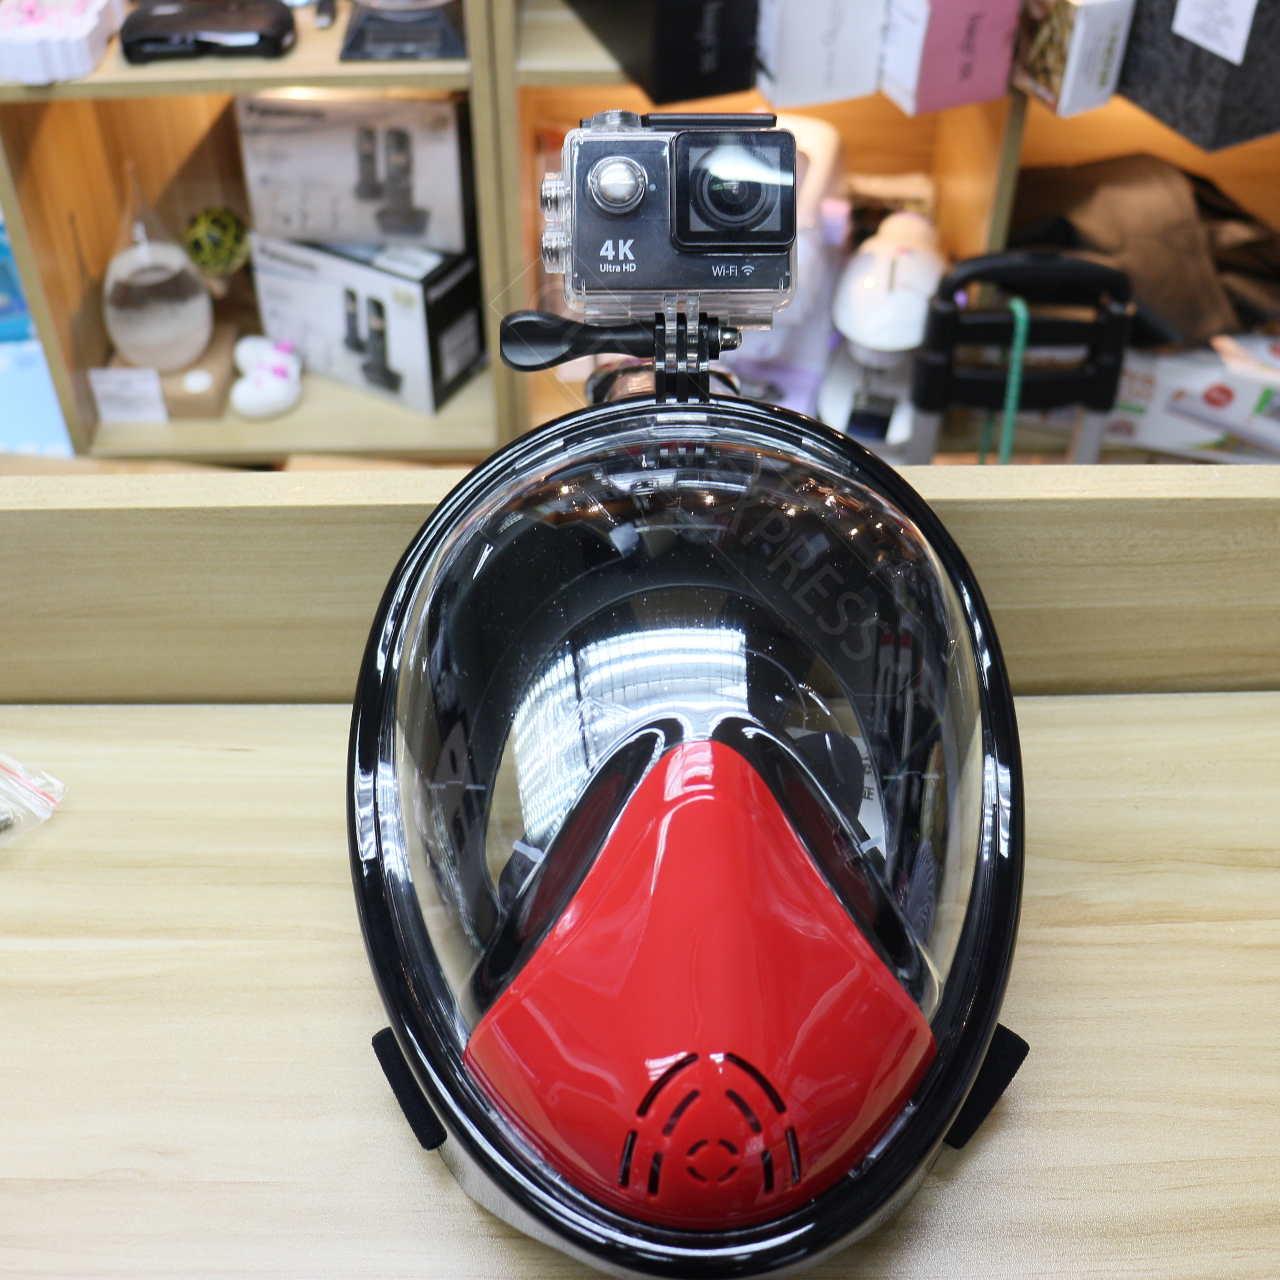 THENICE全乾式防霧浮潛面罩 連Sportcam- Outlet Express HK生活百貨城實拍相片